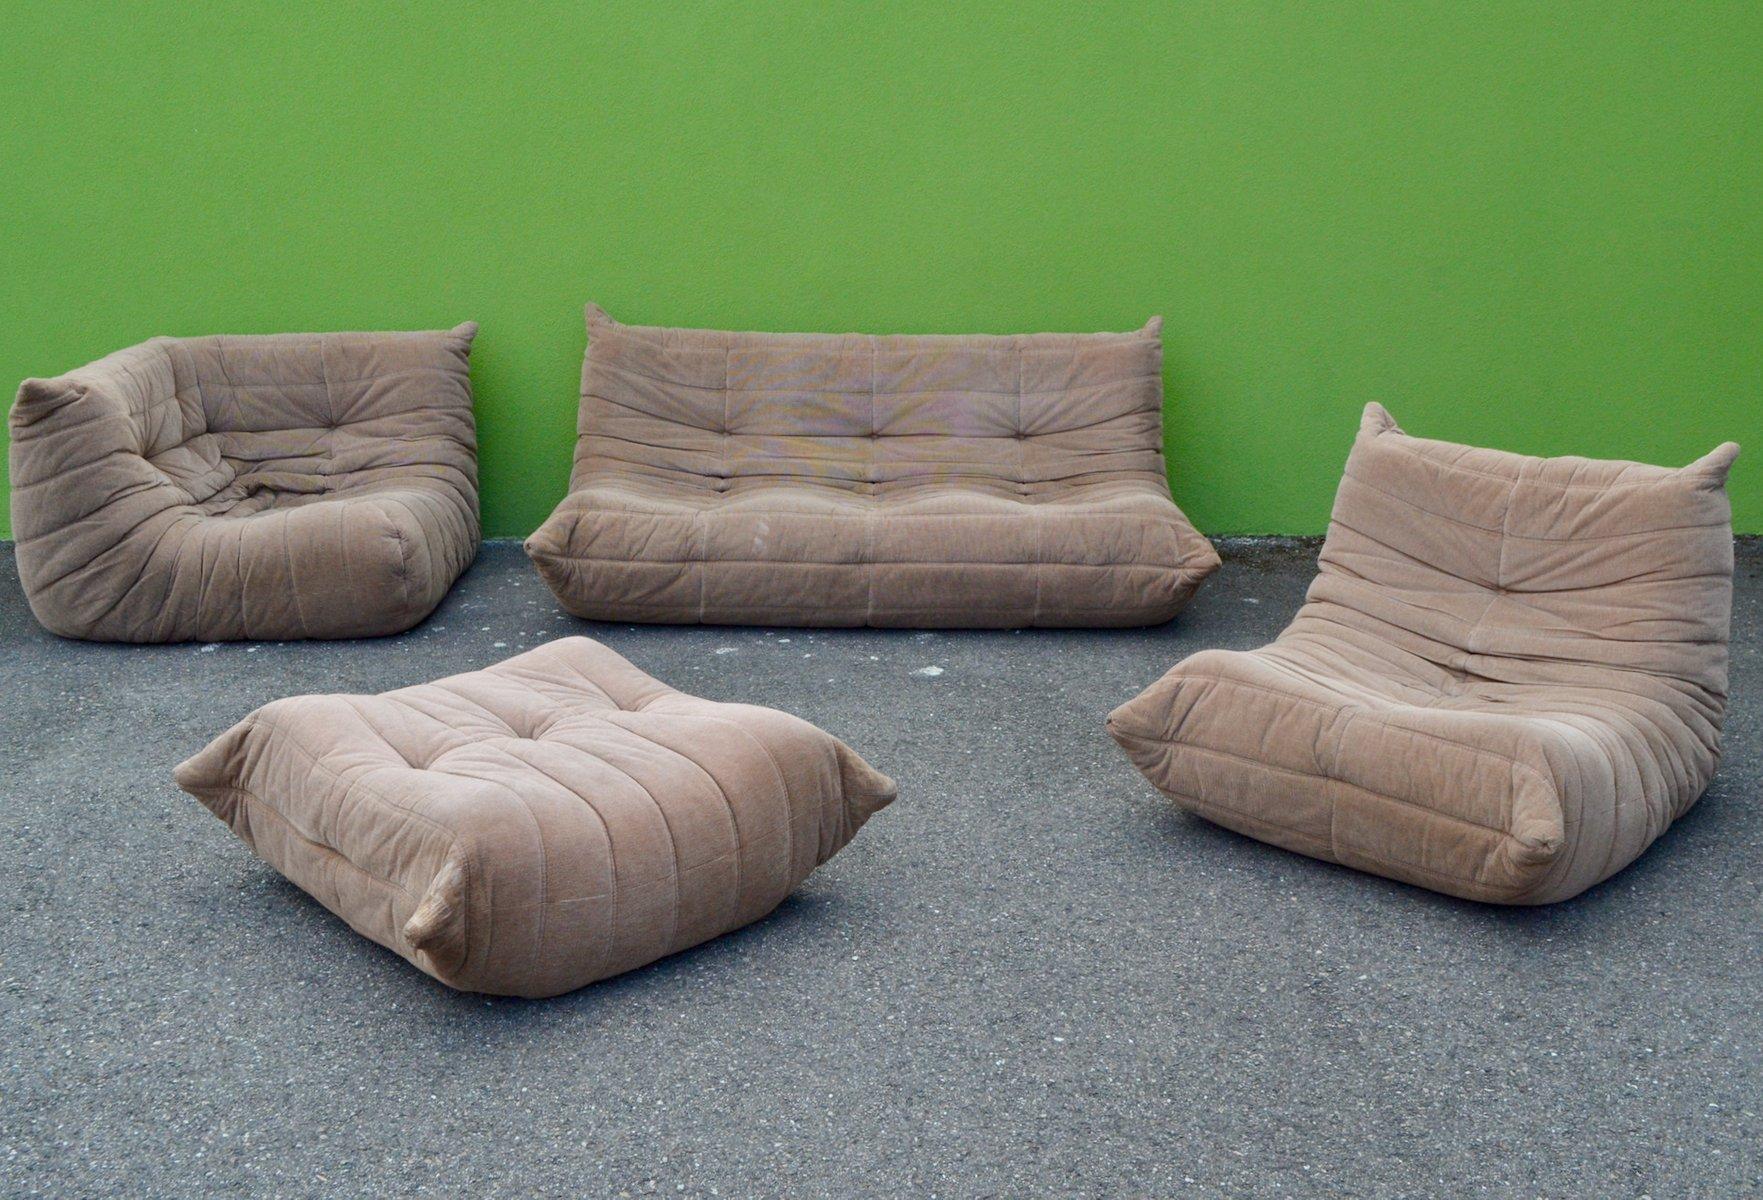 togo sofa set von michel ducaroy f r ligne roset 1970 4er set bei pamono kaufen. Black Bedroom Furniture Sets. Home Design Ideas